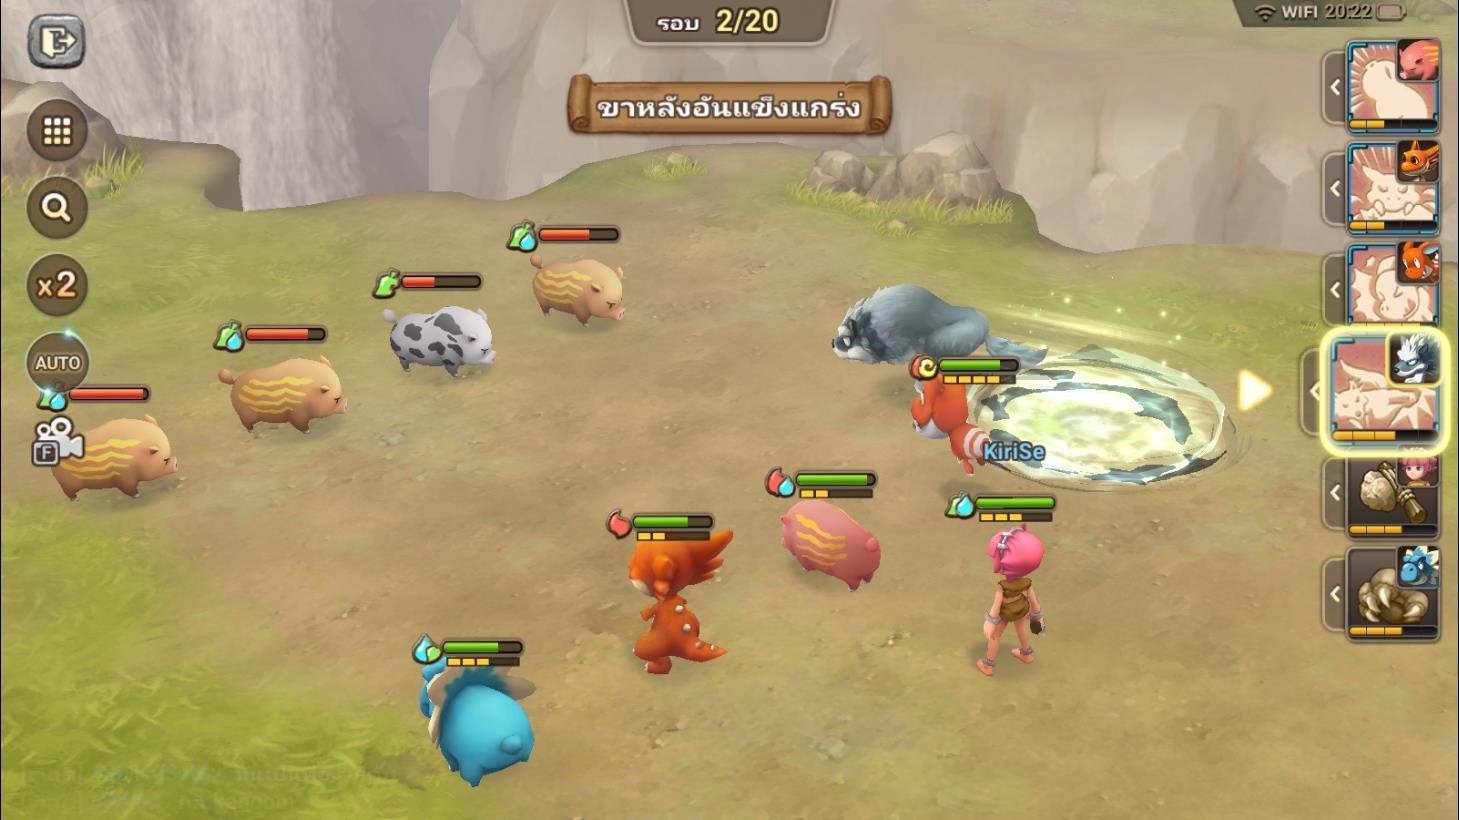 StoneAge World Screenshot 2020.06.24 18.22.50